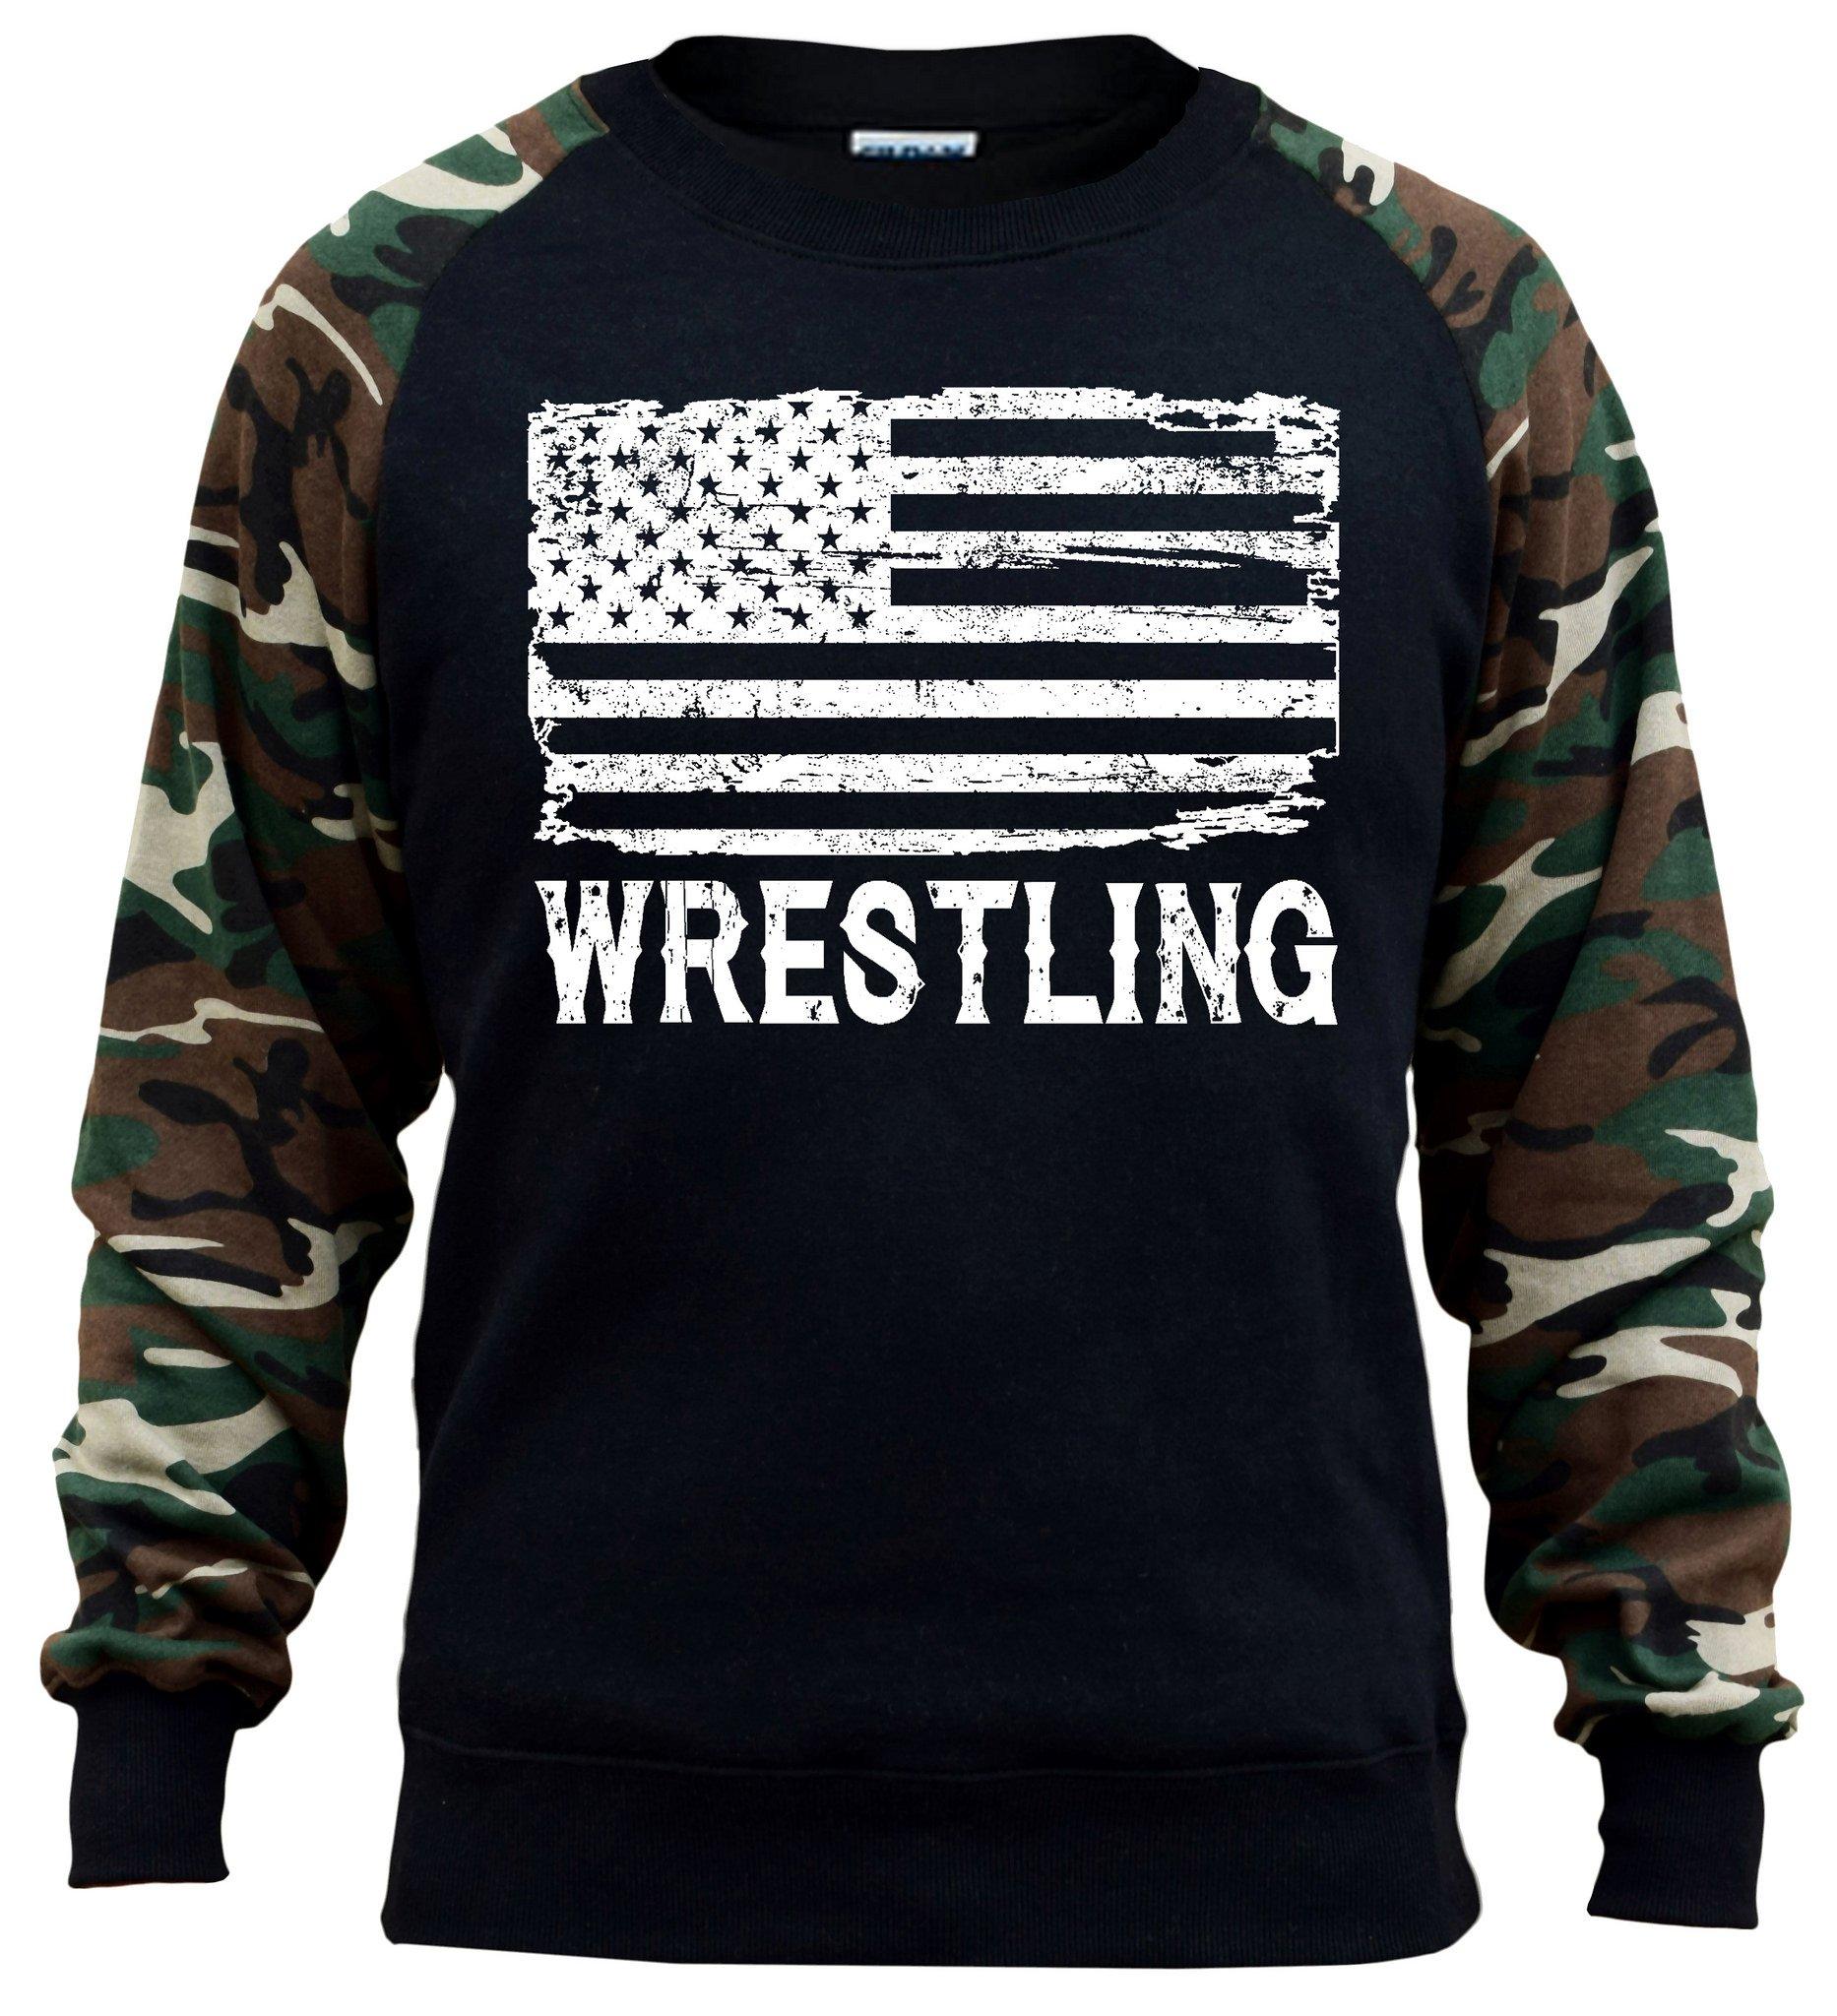 Interstate Apparel Men's Wrestling American Flag Black/Camo Raglan Baseball Sweatshirt X-Large Black